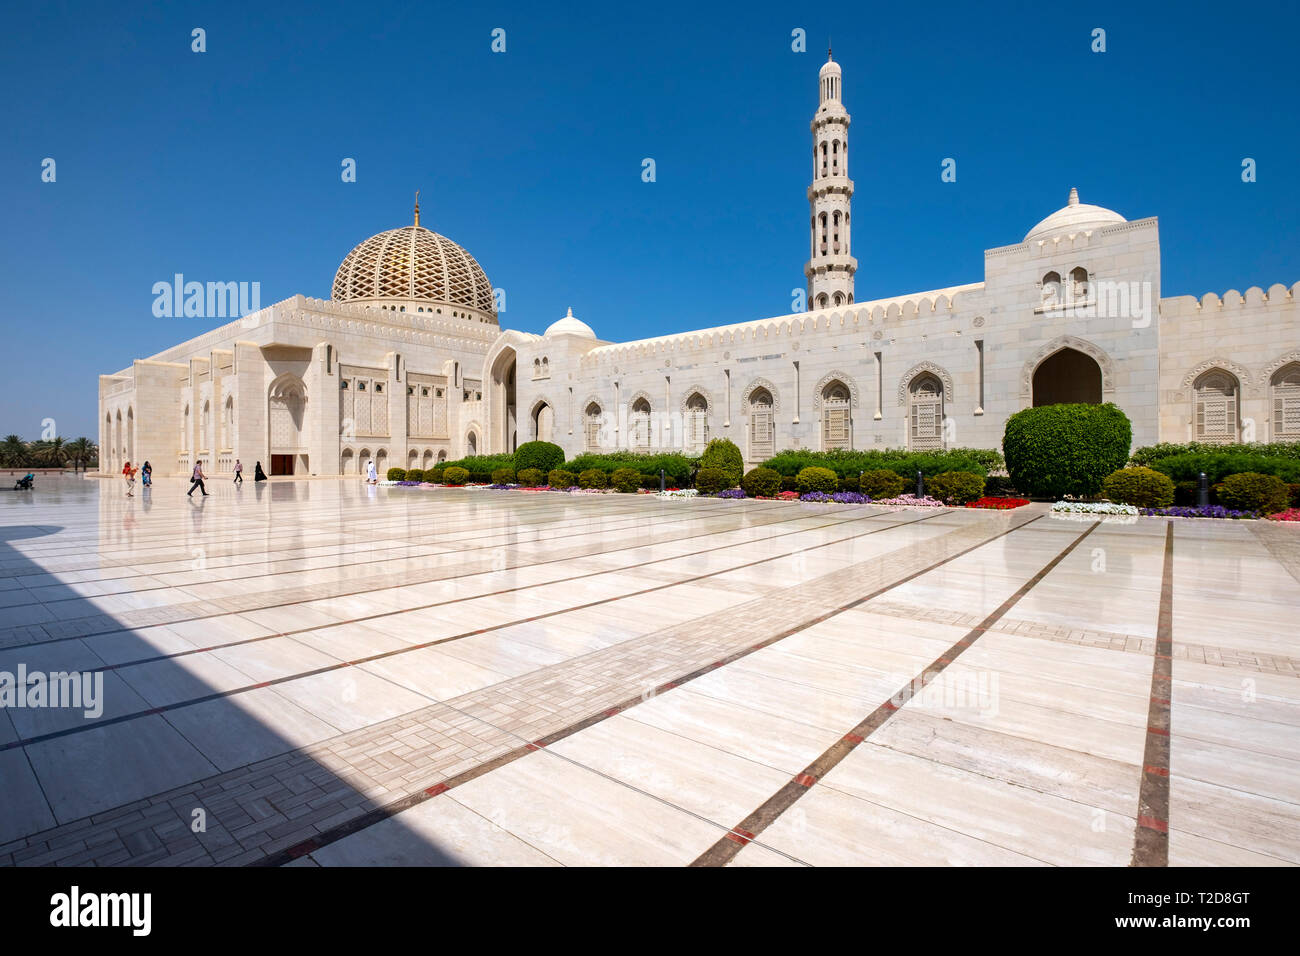 Sultan Qaboos Grand Mosque in Muscat, Oman Stock Photo